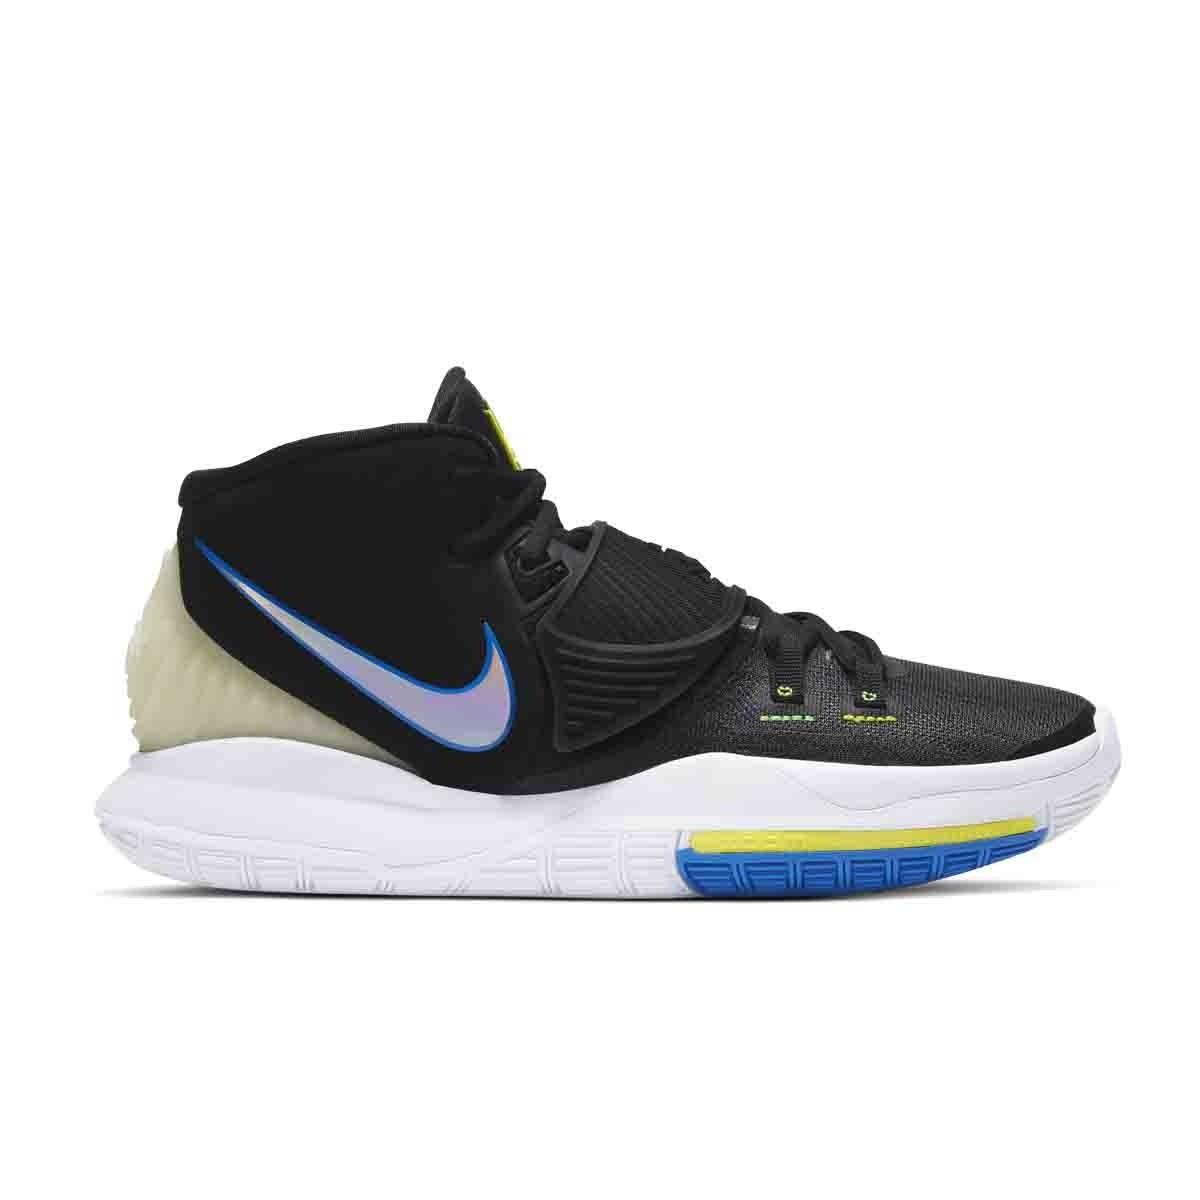 Nike Kyrie 6 'Shutter Shades'